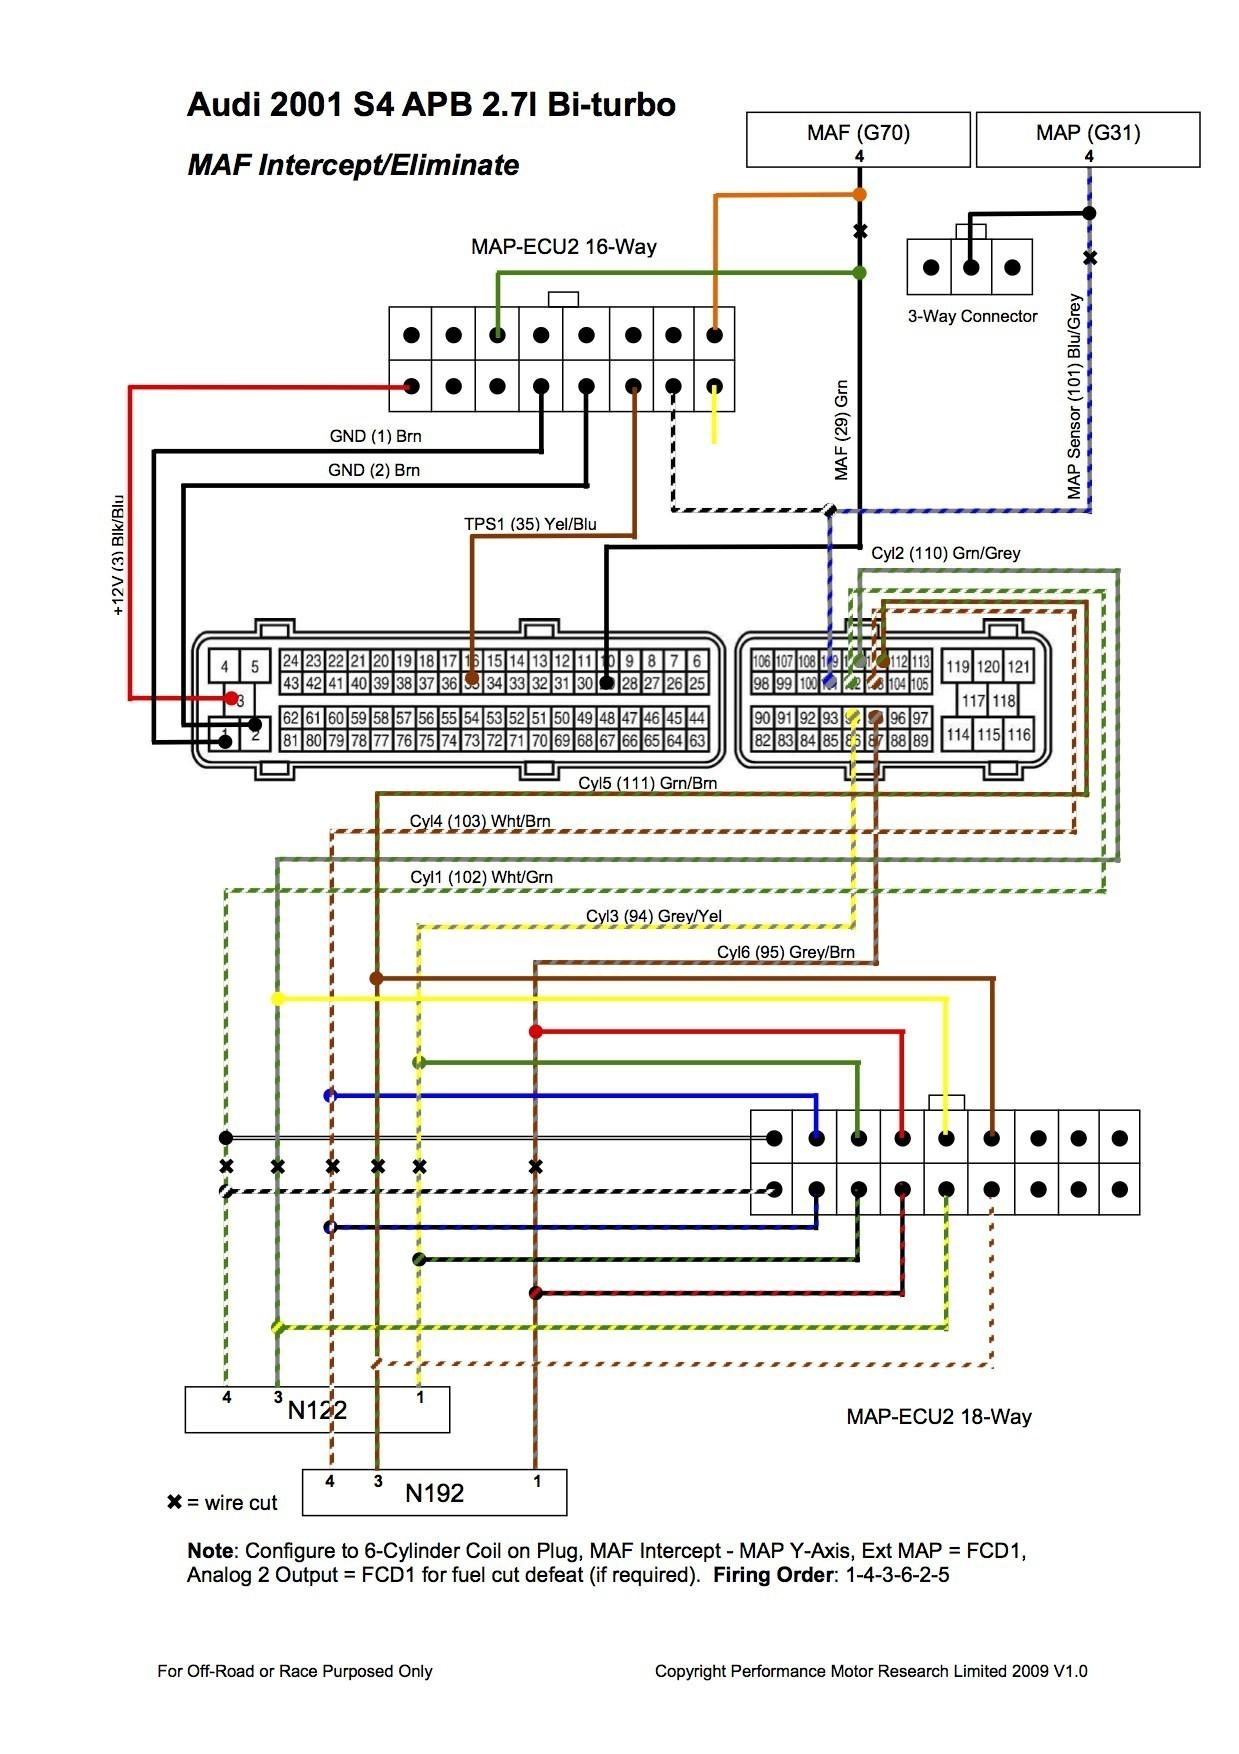 2000 Dodge Durango Stereo Wiring Diagram | Free Wiring Diagram